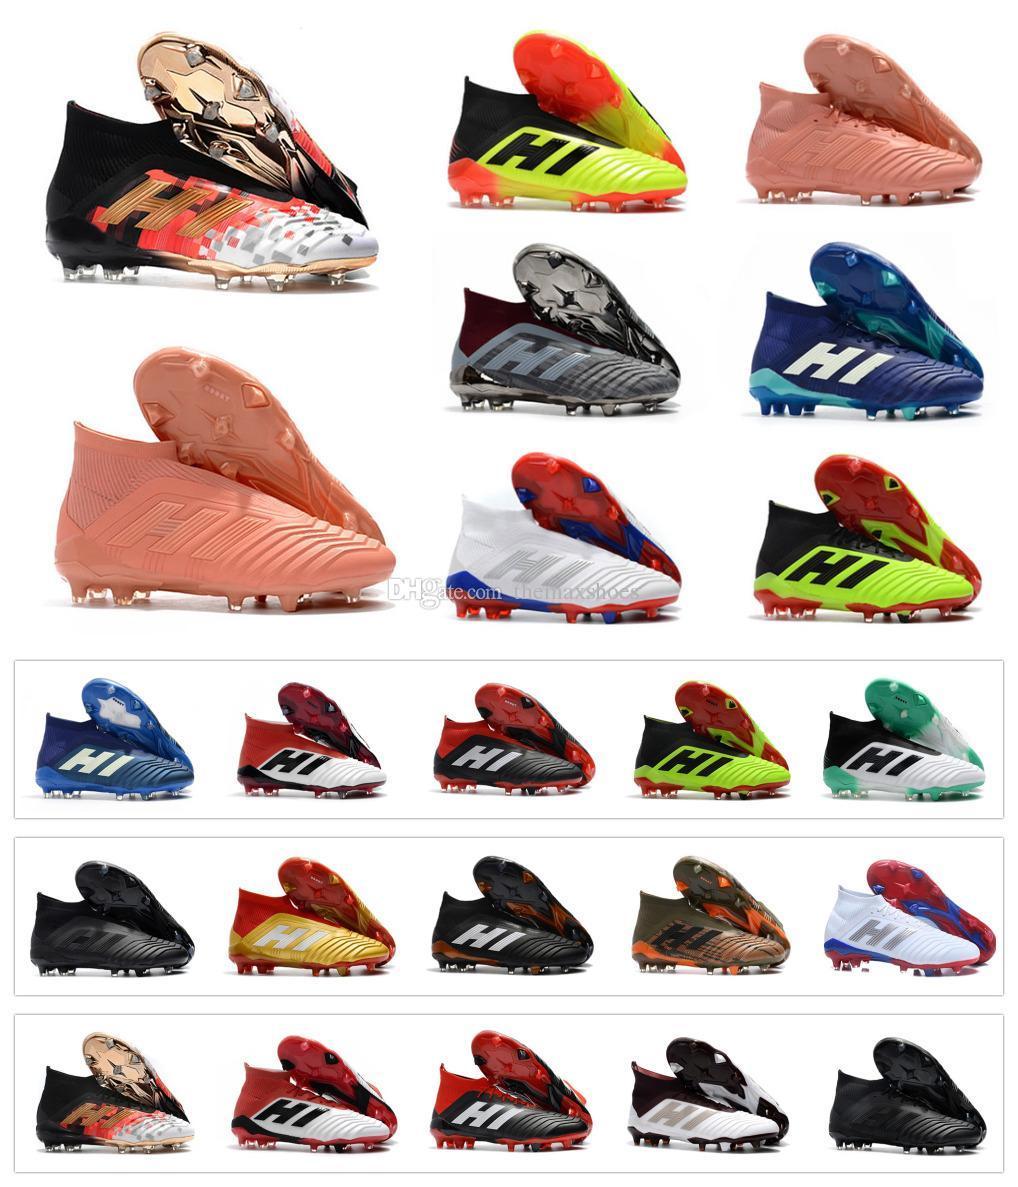 Nuevo Predator 18 Predator 18.1 FG PP Paul Pogba soccer 18 x tacos Slip On botas de fútbol para hombre zapatos de fútbol de alta calidad